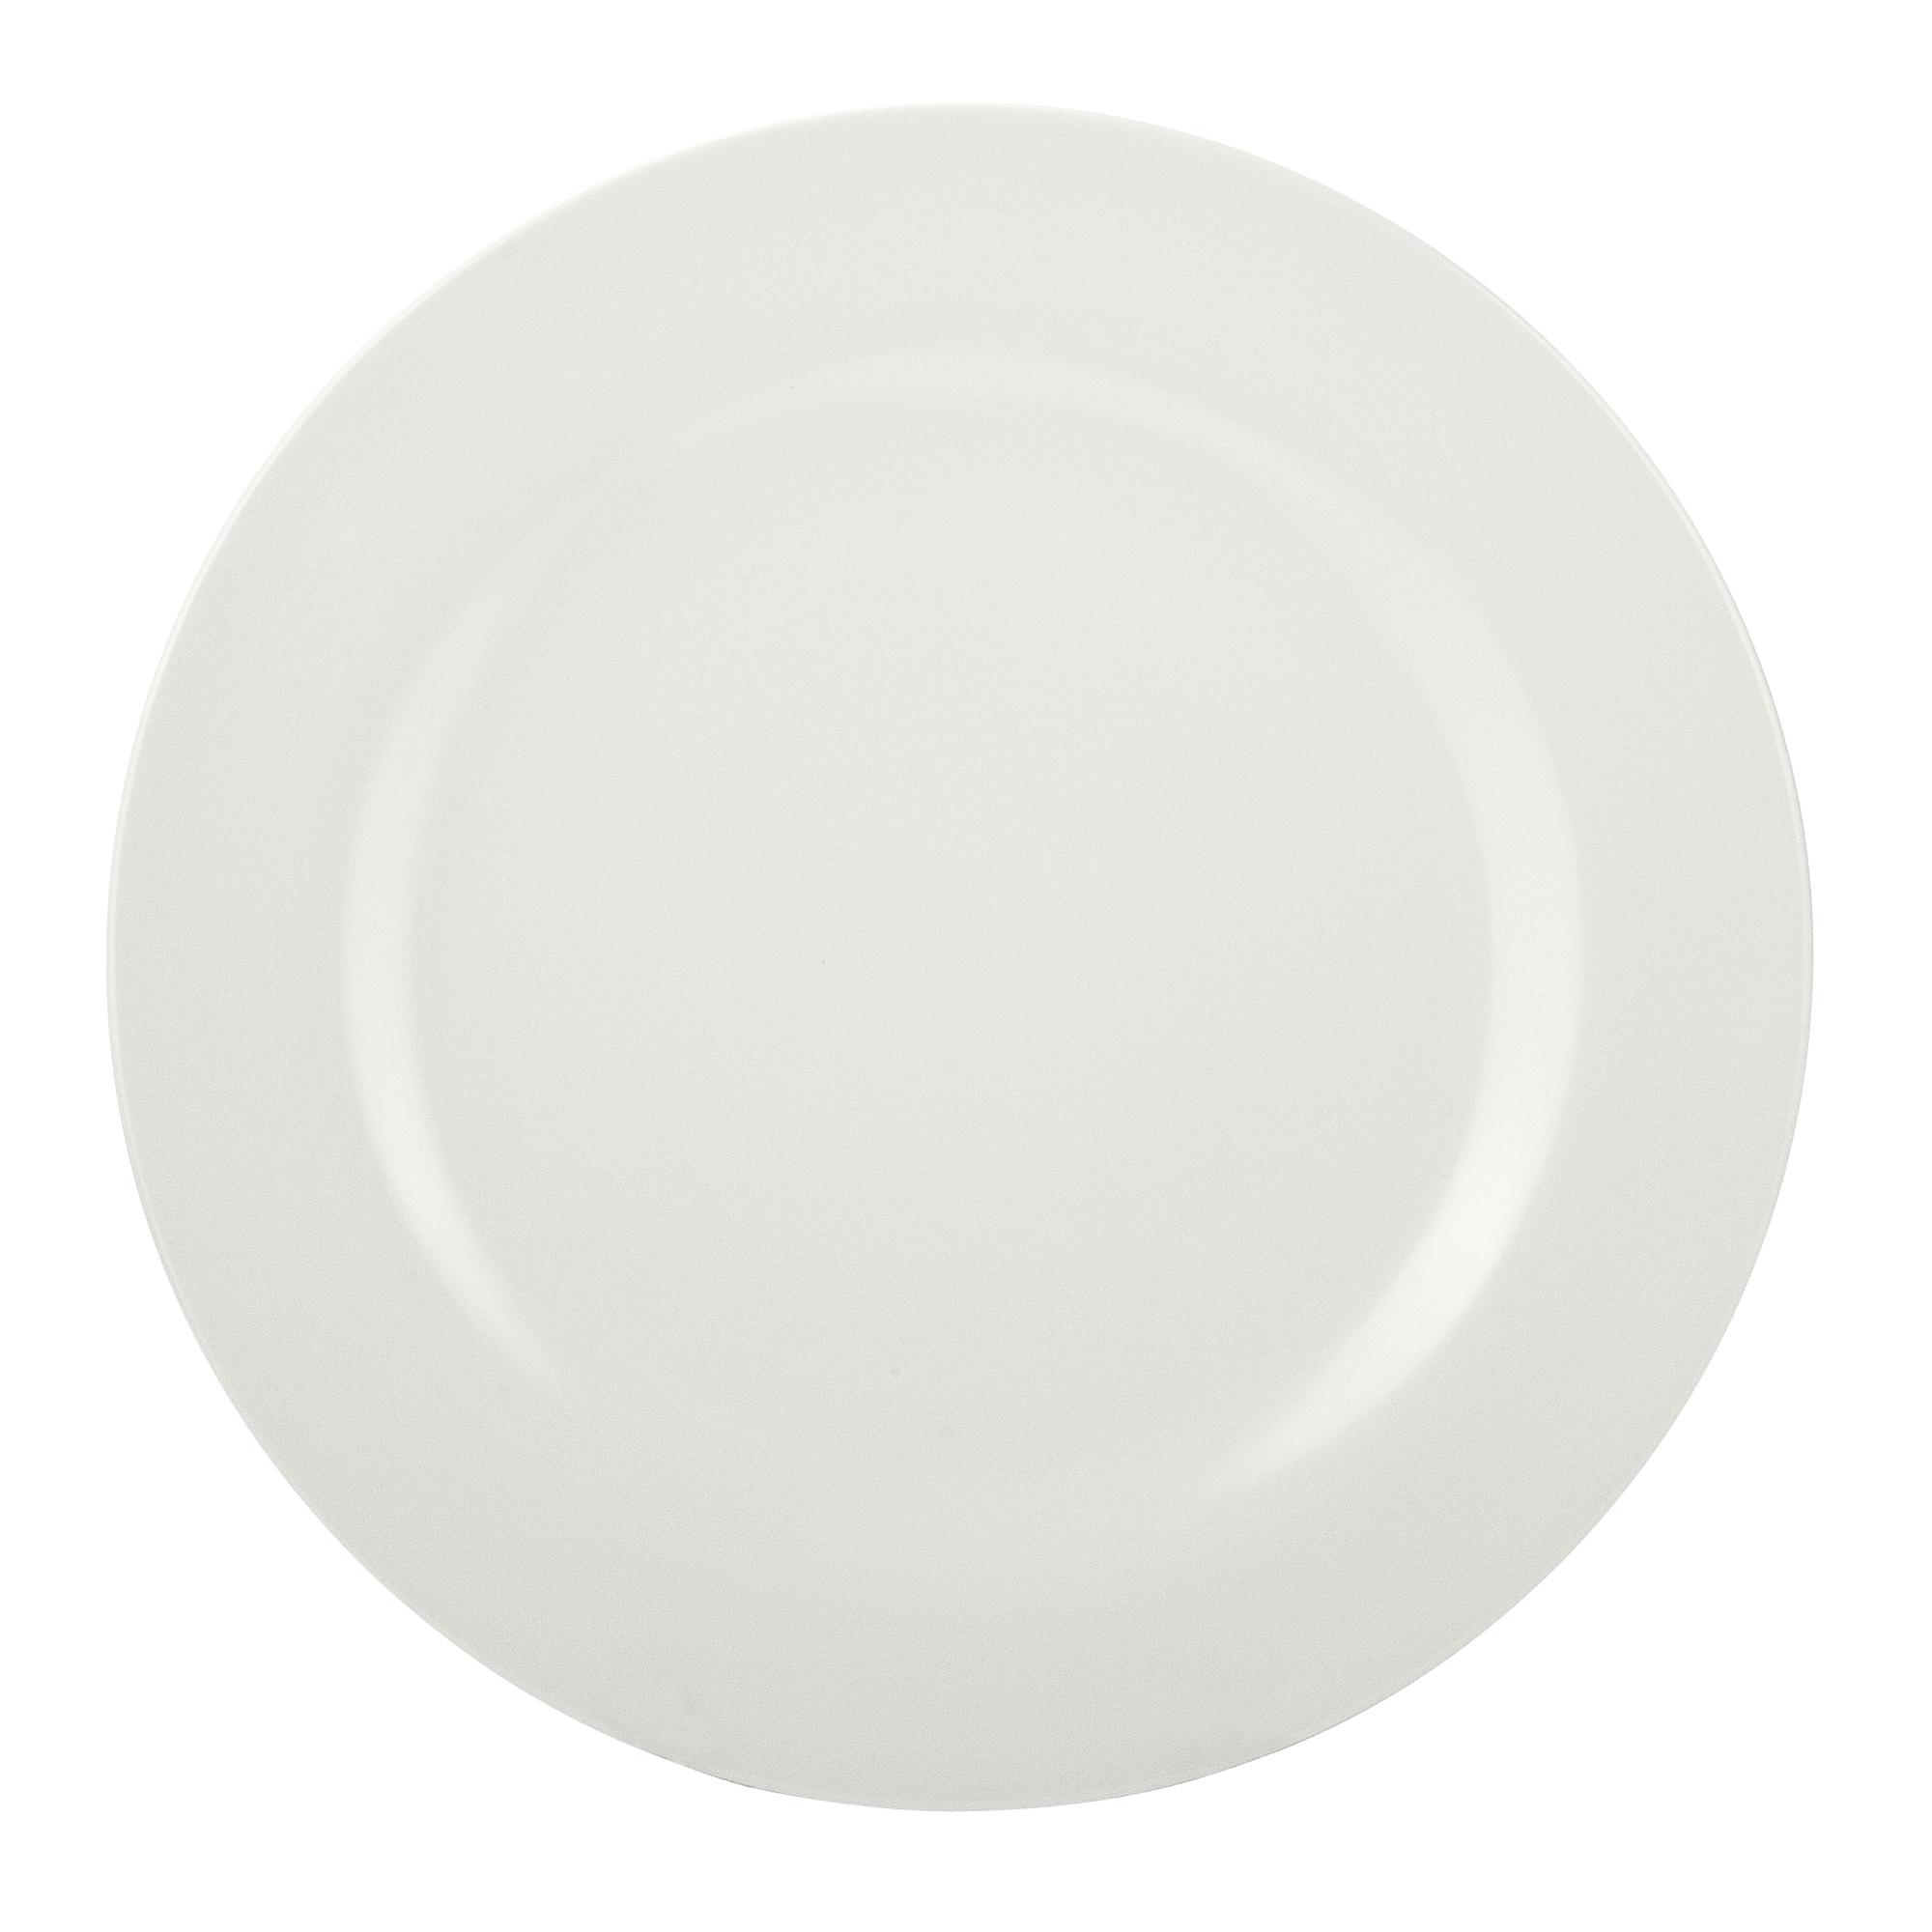 Ella Salad Plate, Eggshell White, 6-piece set slideshow image 9